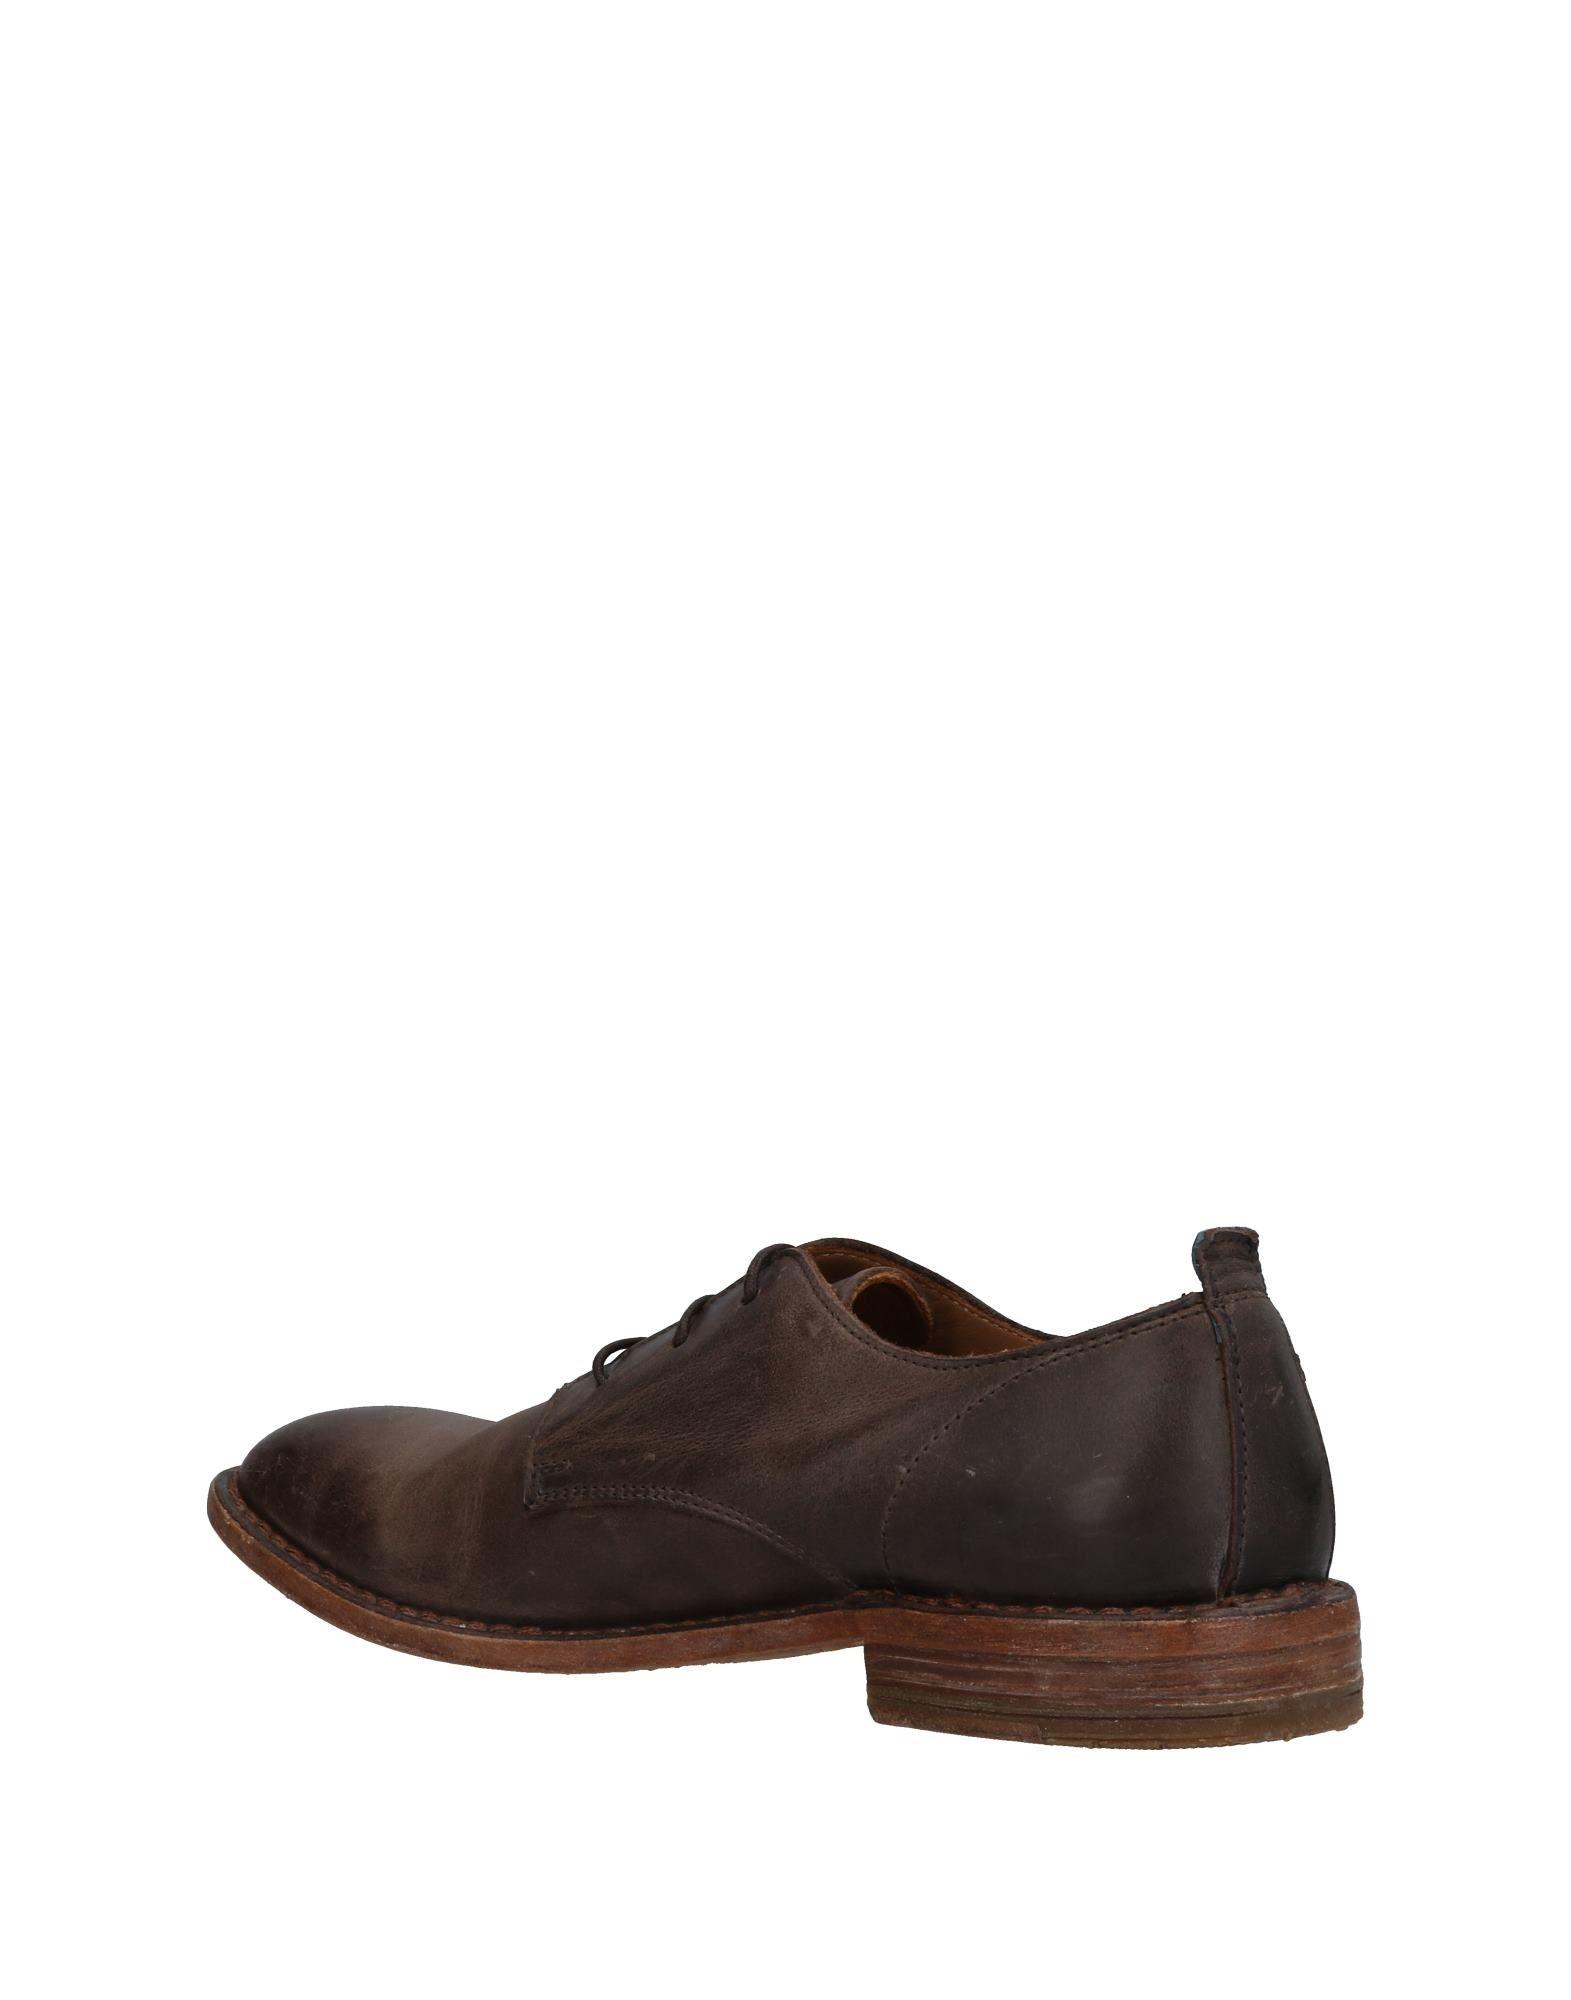 Haltbare Mode billige Schuhe Moma Schnürschuhe Heiße Damen  11446282WV Heiße Schnürschuhe Schuhe 5f7670